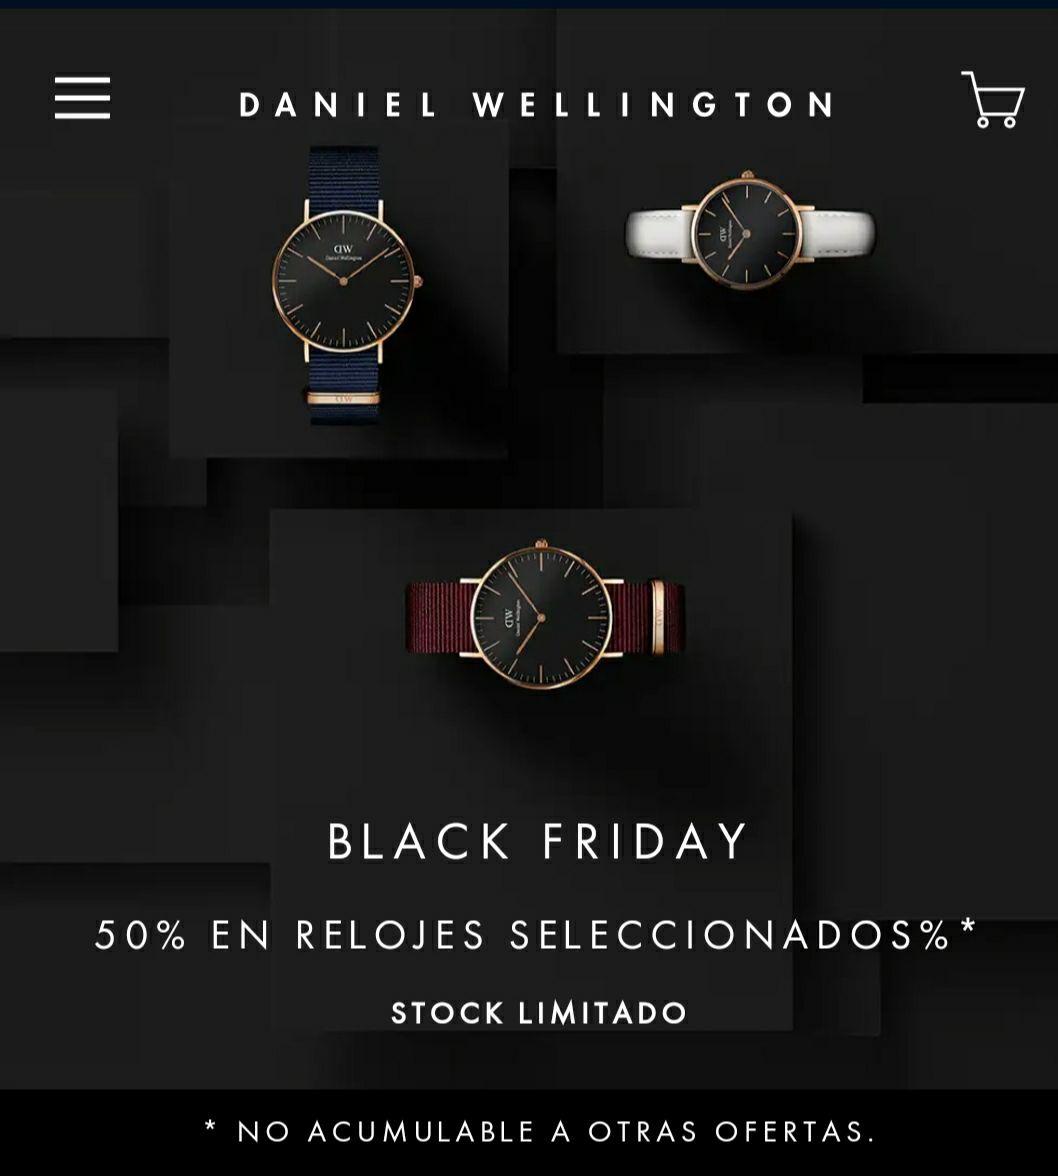 Relojes Daniel Wellington -50%